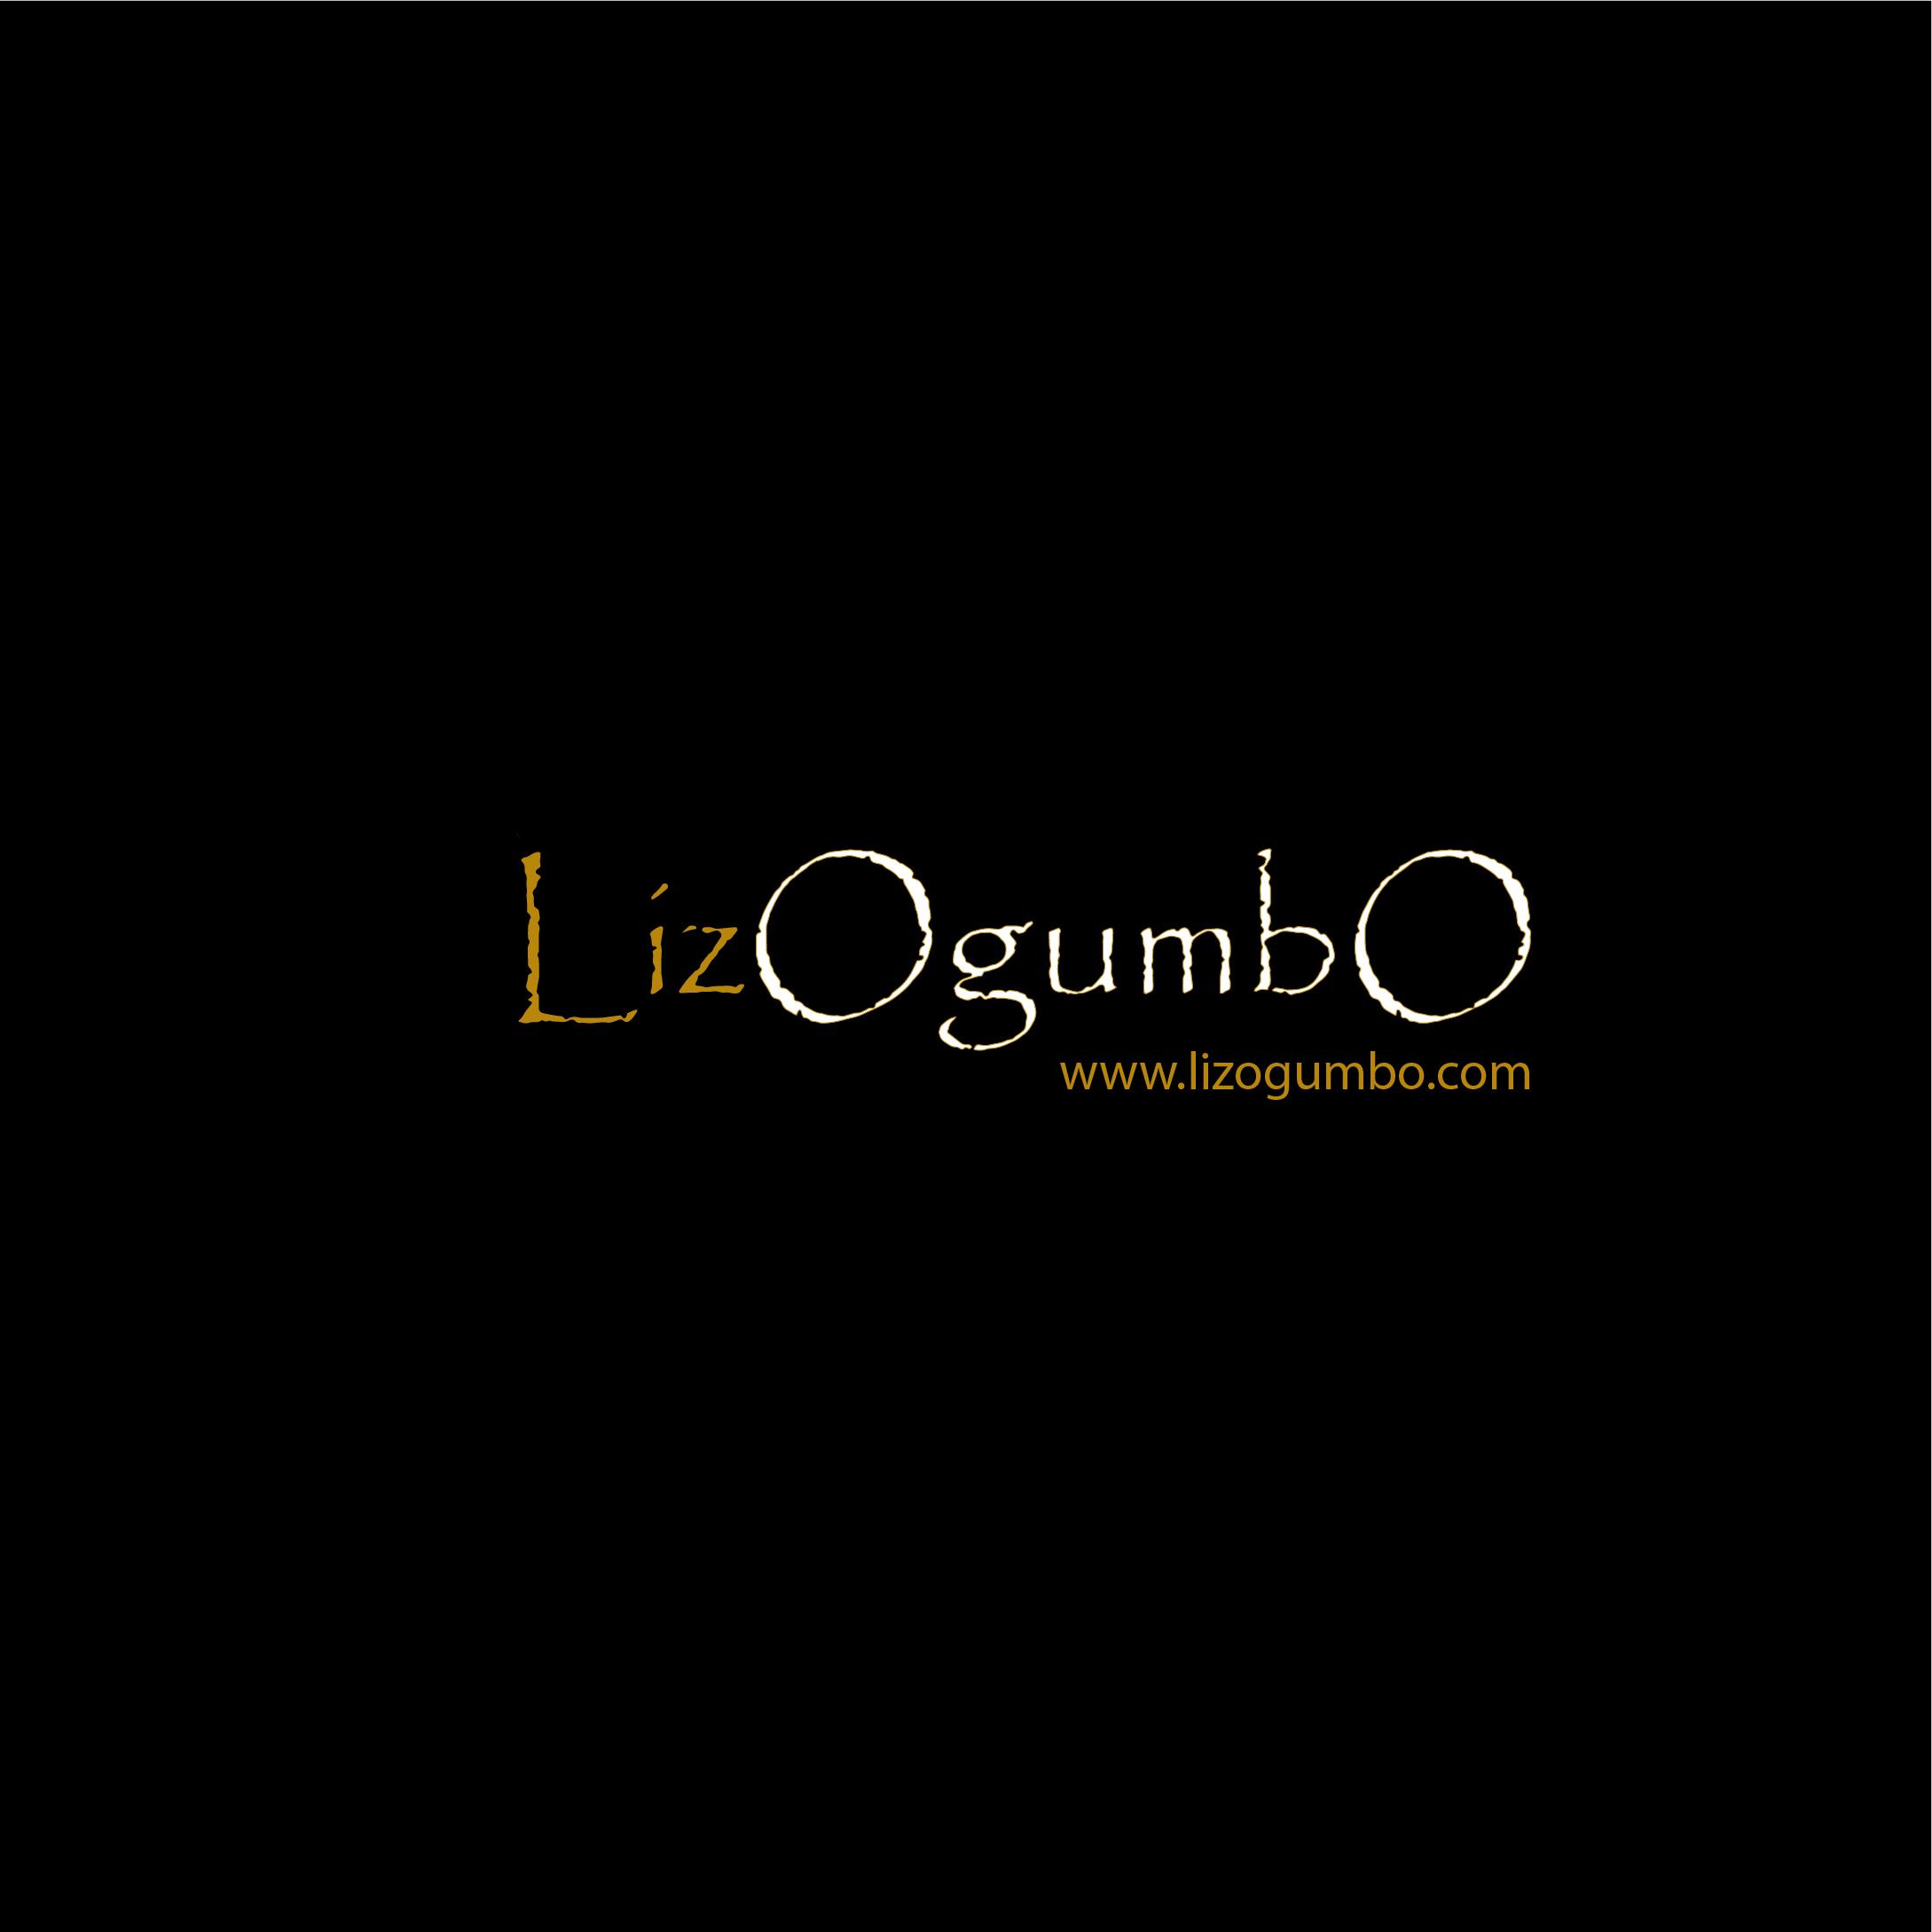 Liz Ogumbo's Signature